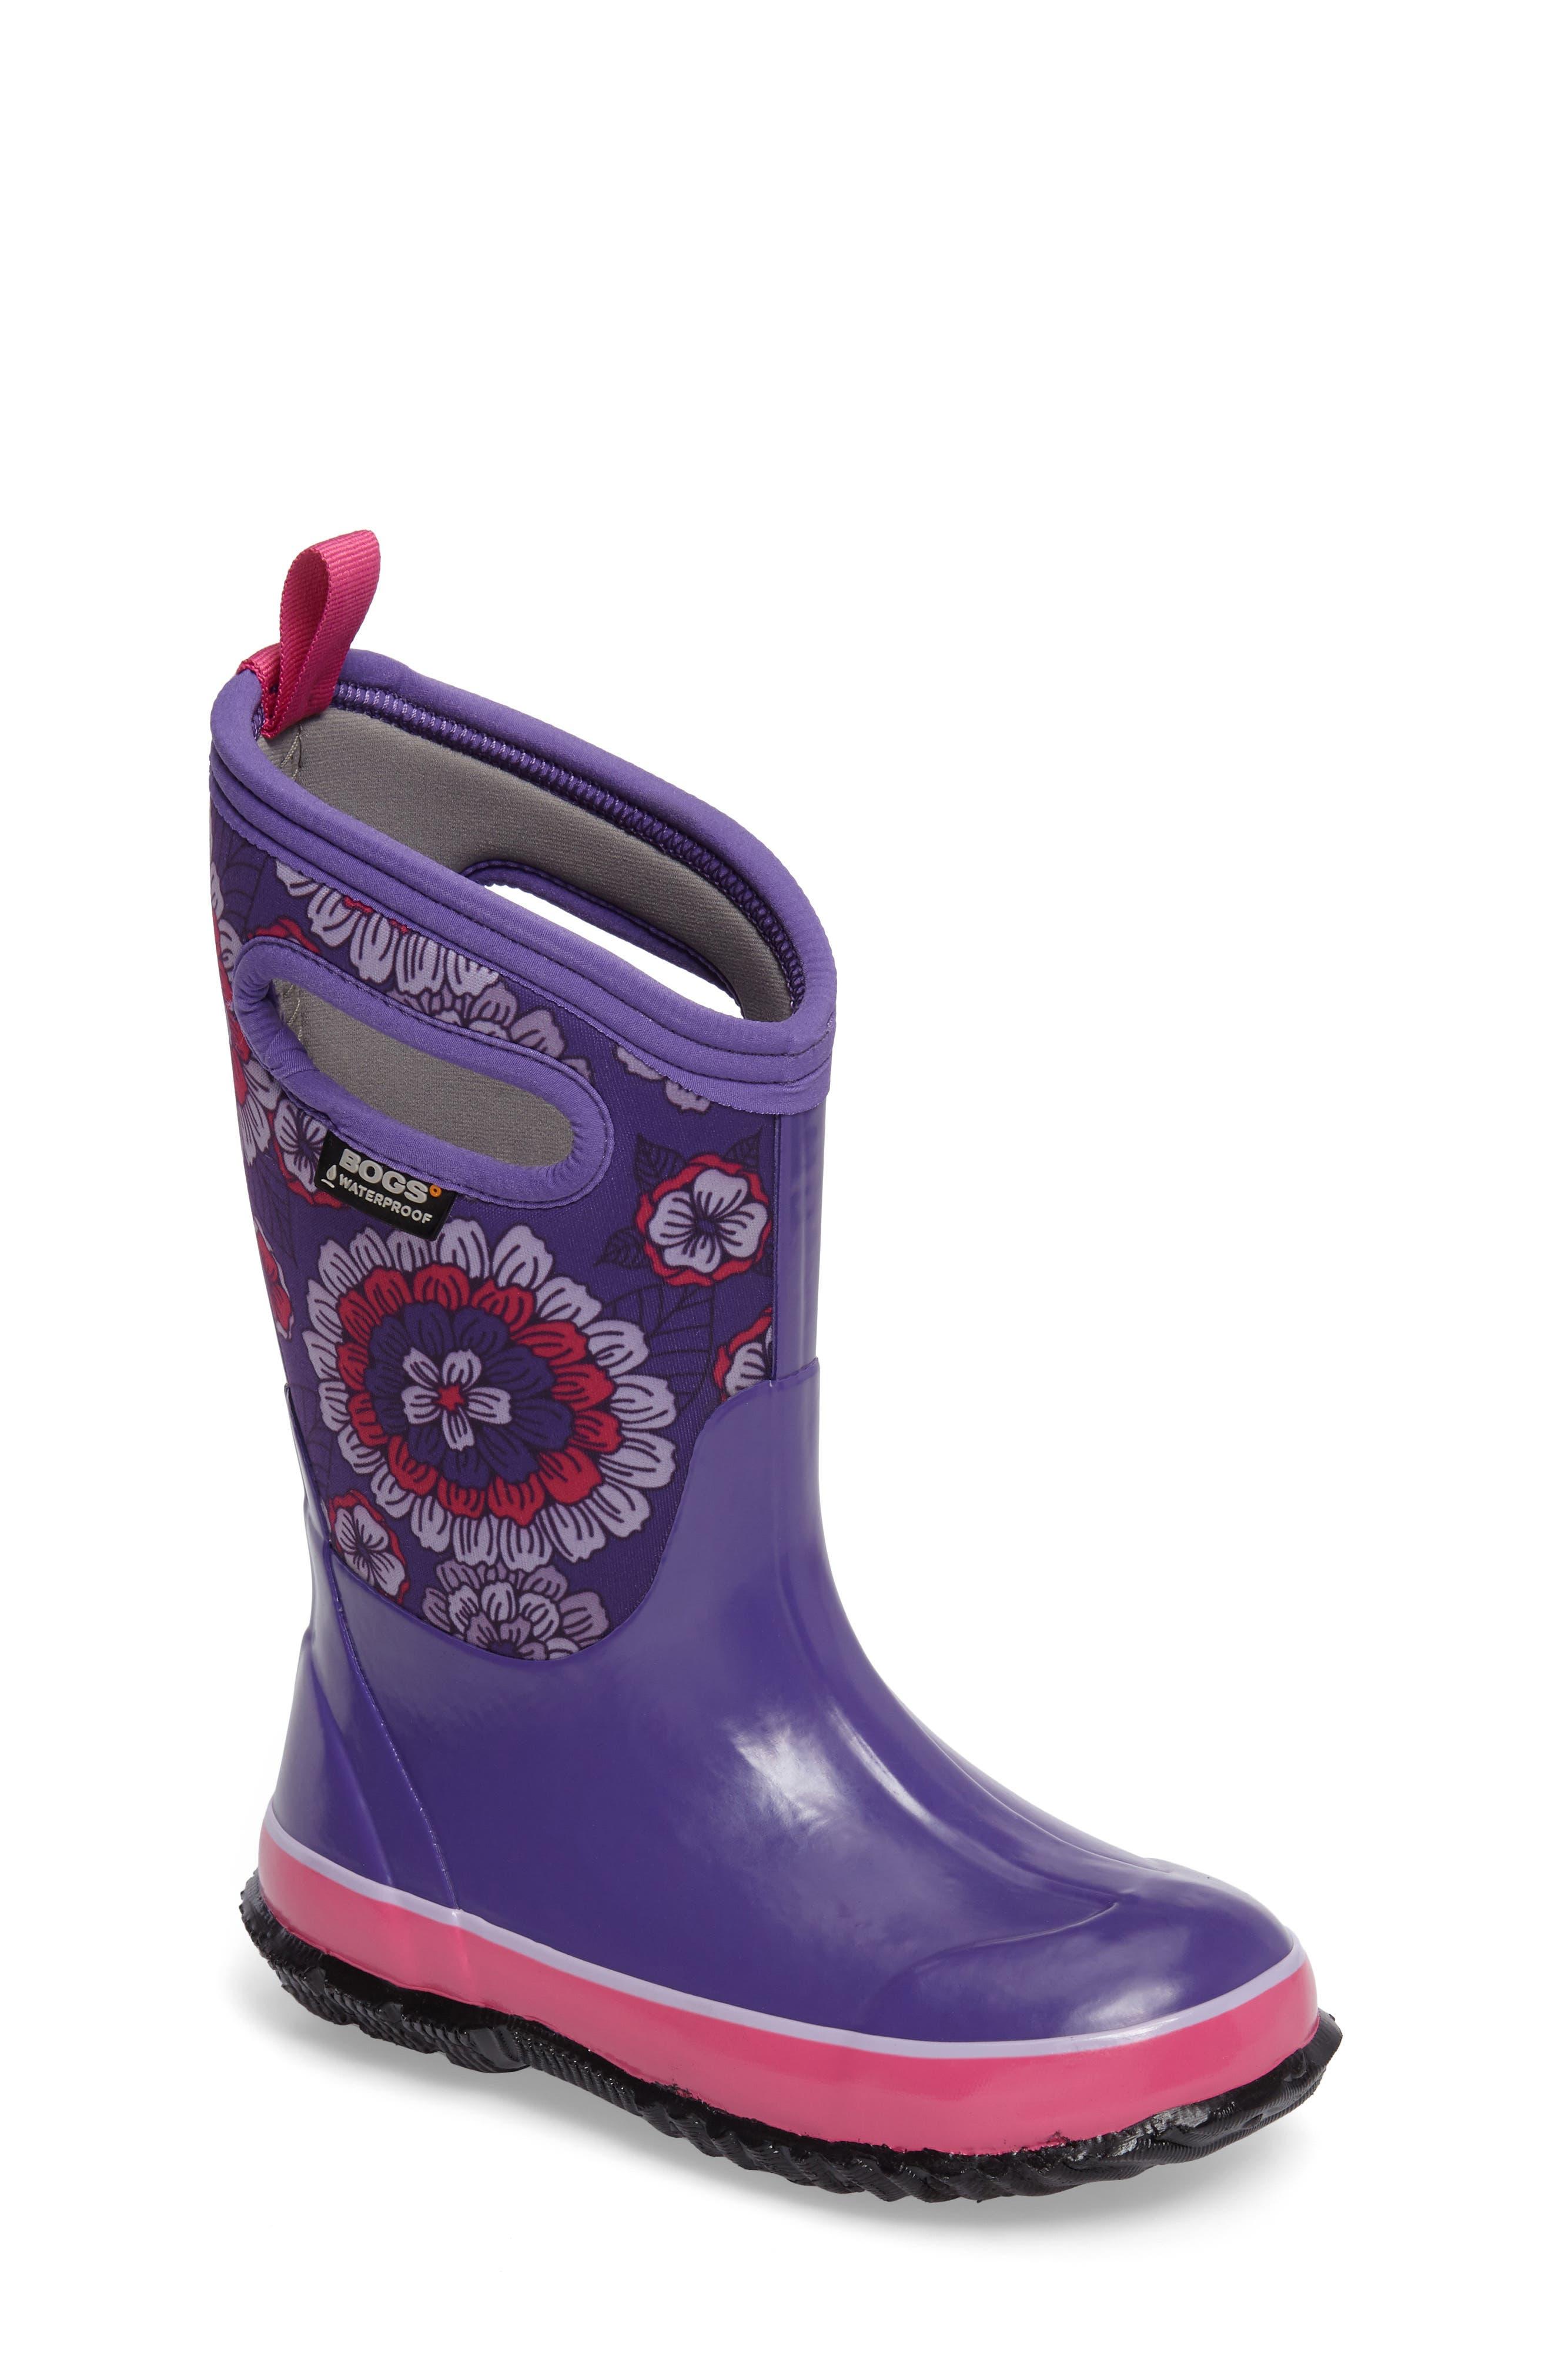 Alternate Image 1 Selected - Bogs Classic Pansies Insulated Waterproof Rain Boot (Toddler, Little Kid & Big Kid)